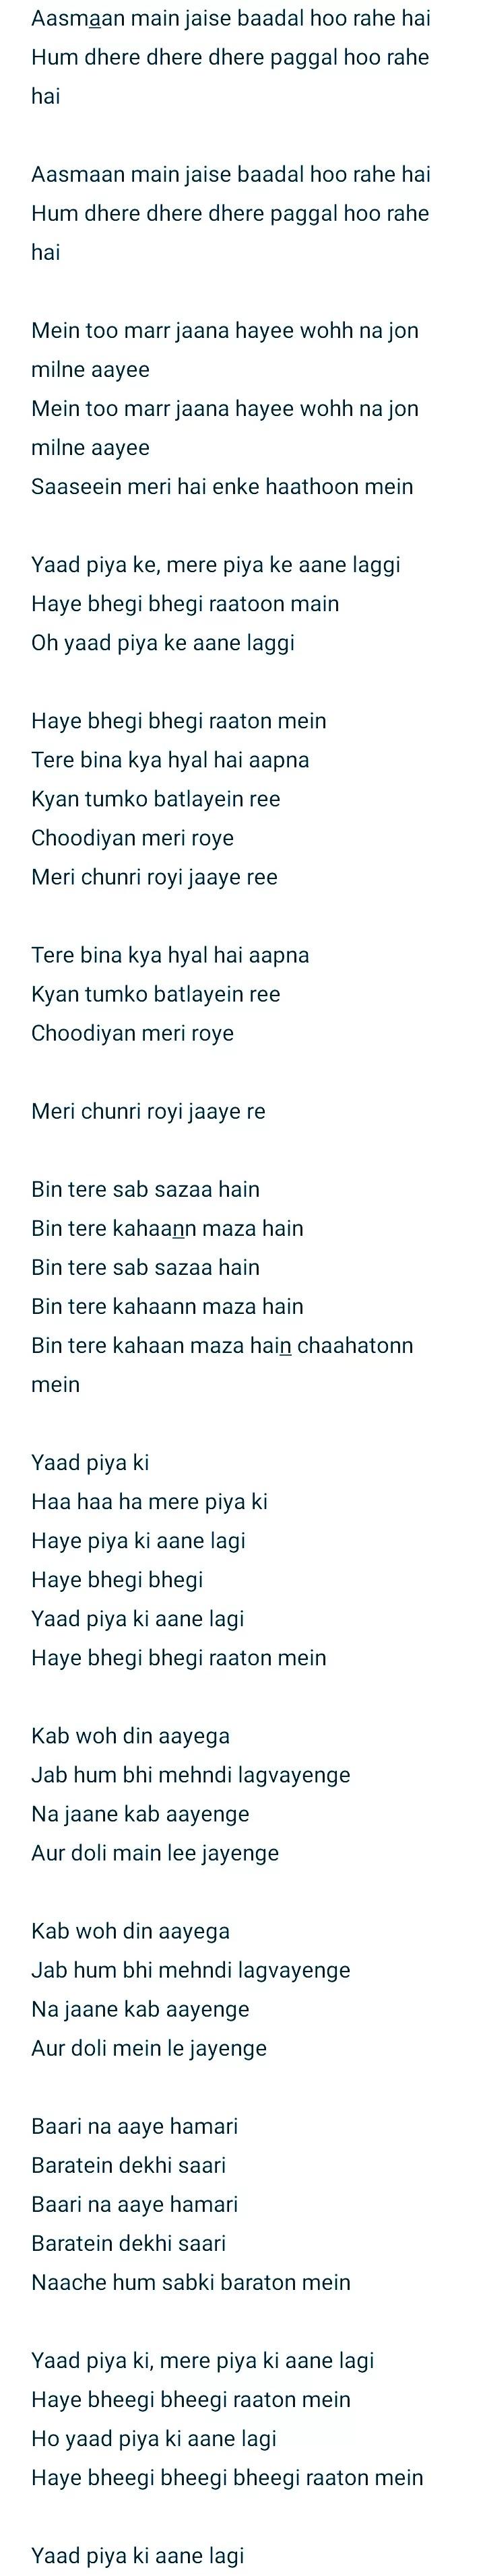 yaad piya ki aane lagi lyrics याद पिया की - neha kakkar